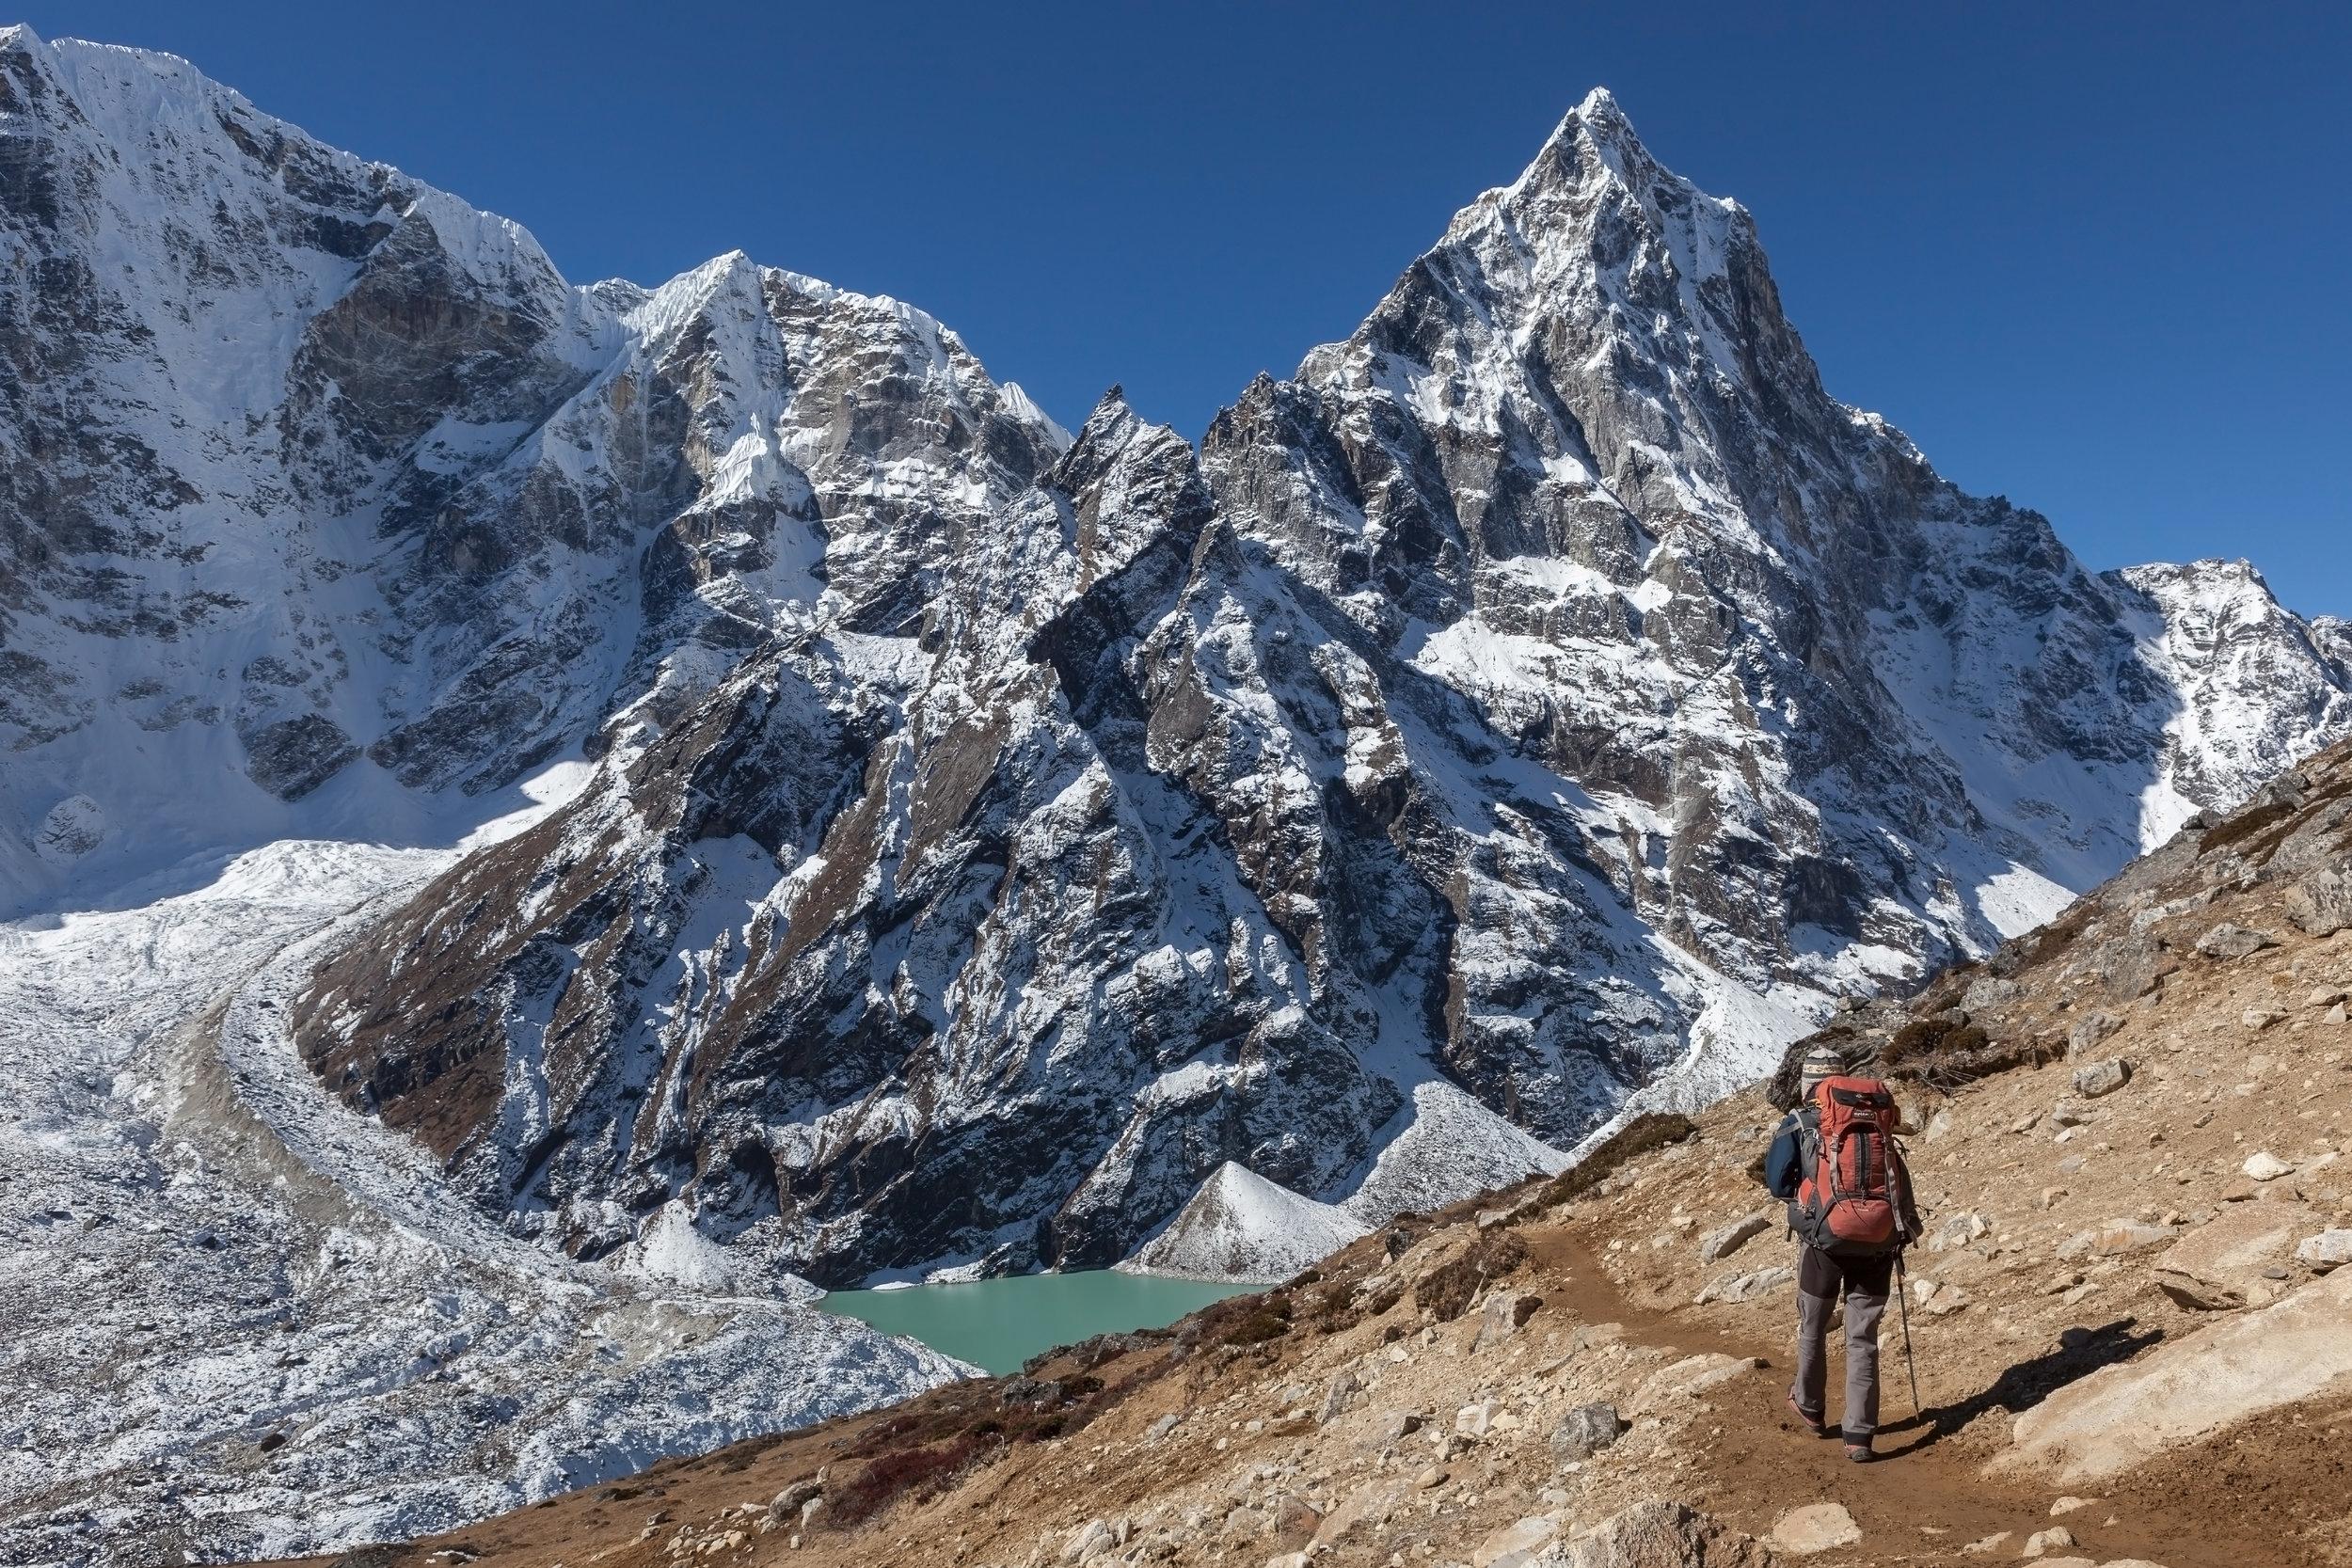 nepal_bigstock-Active-Hiker-Trekking-In-Nepal-186325393.jpg